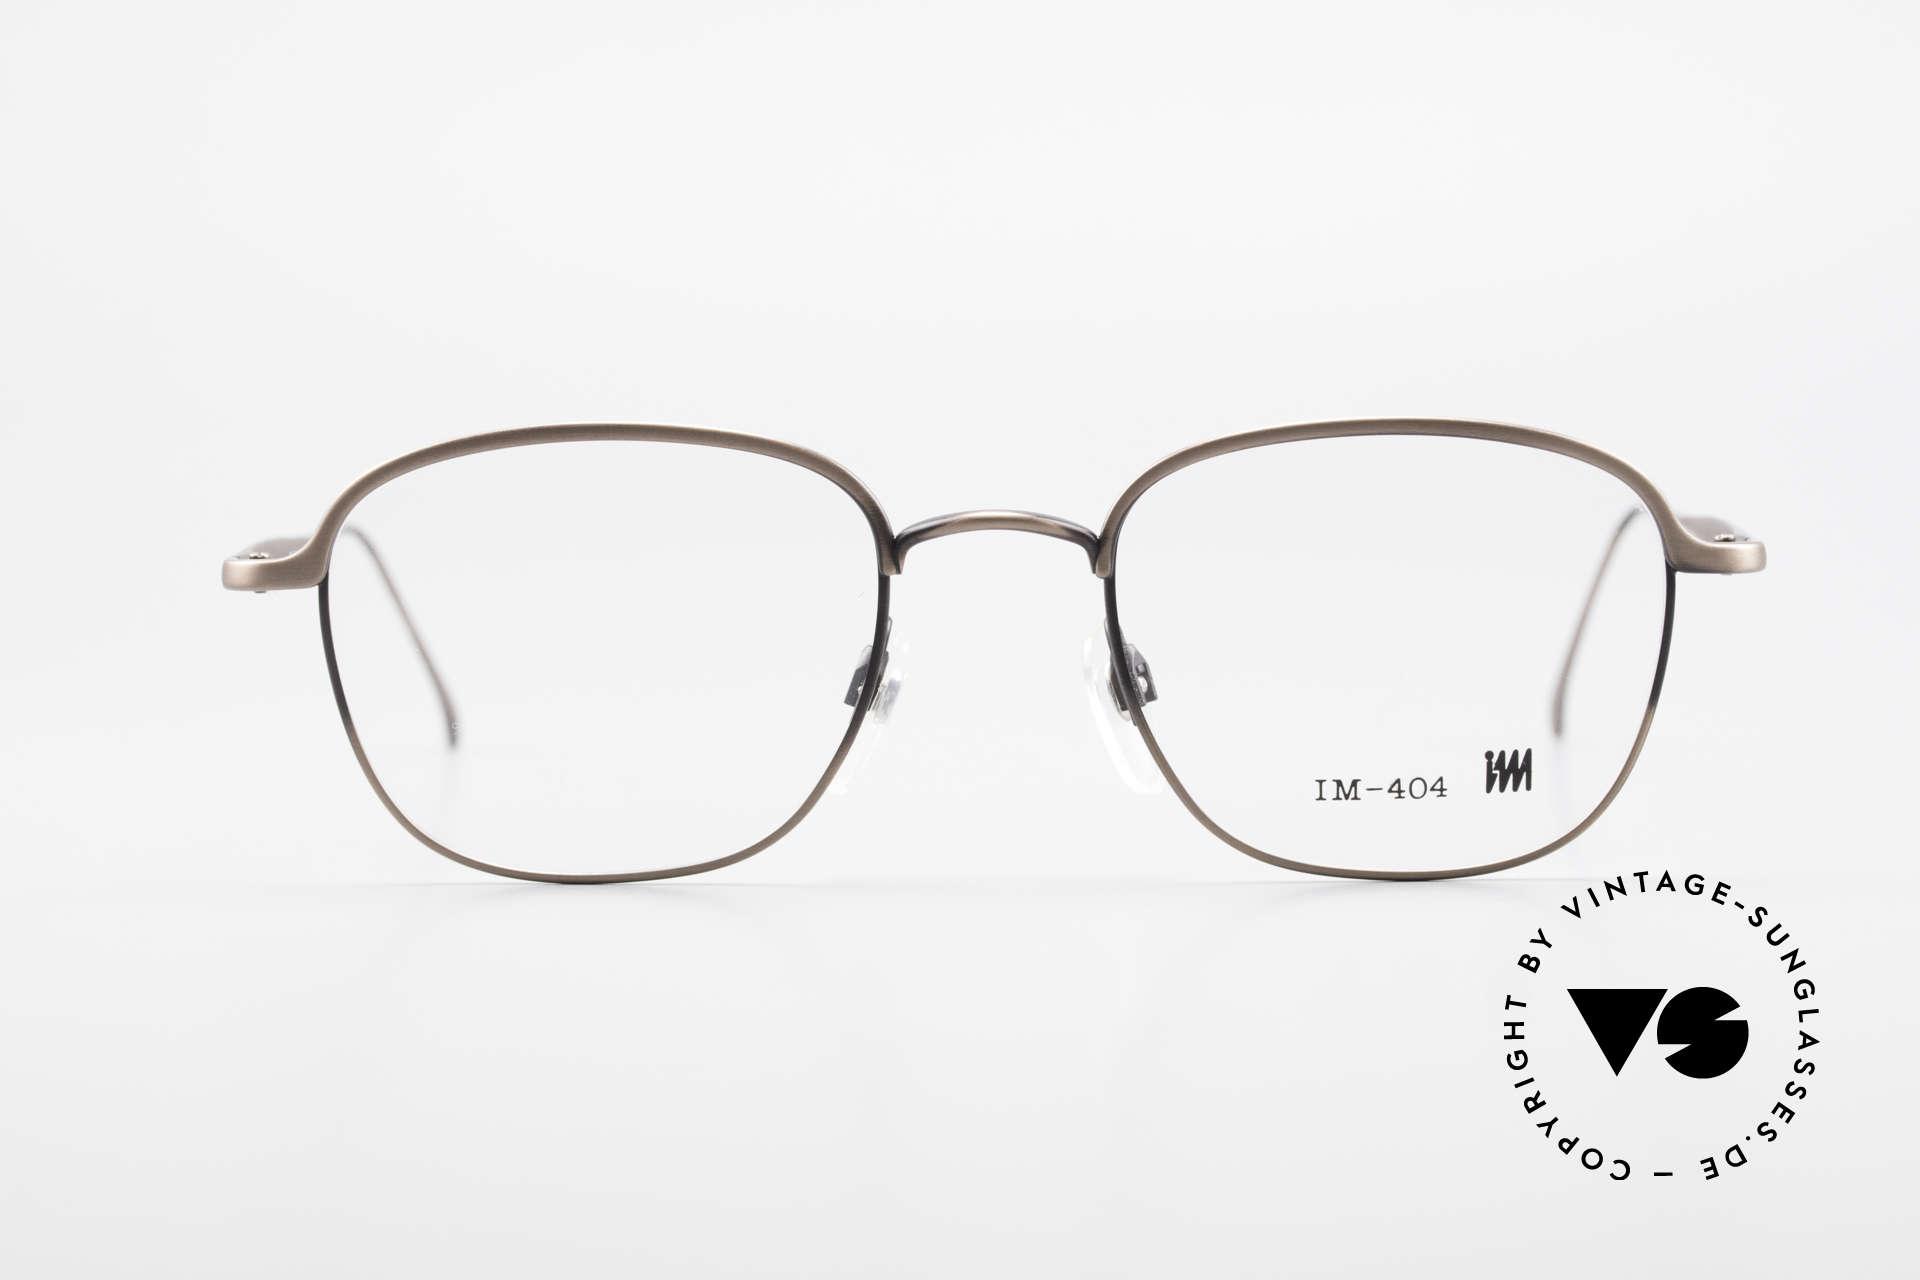 Miyake Design Studio IM404 Connoisseur Eyeglasses 90's, true INSIDER eyeglasses without big branding, Made for Men and Women